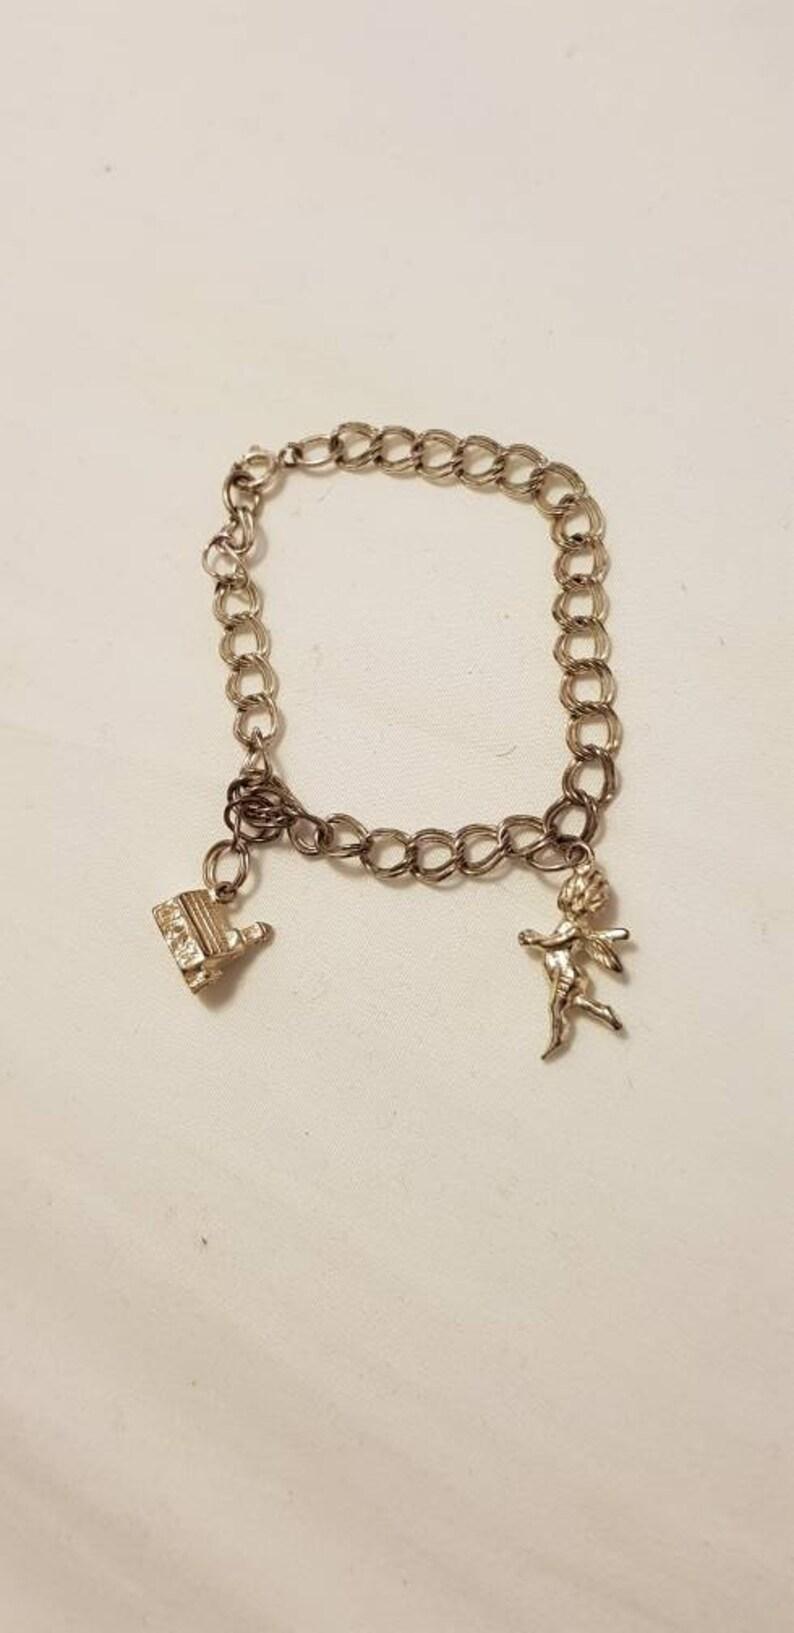 4bc0ee390294e Vintage double loop sterling silver charm bracelet 6